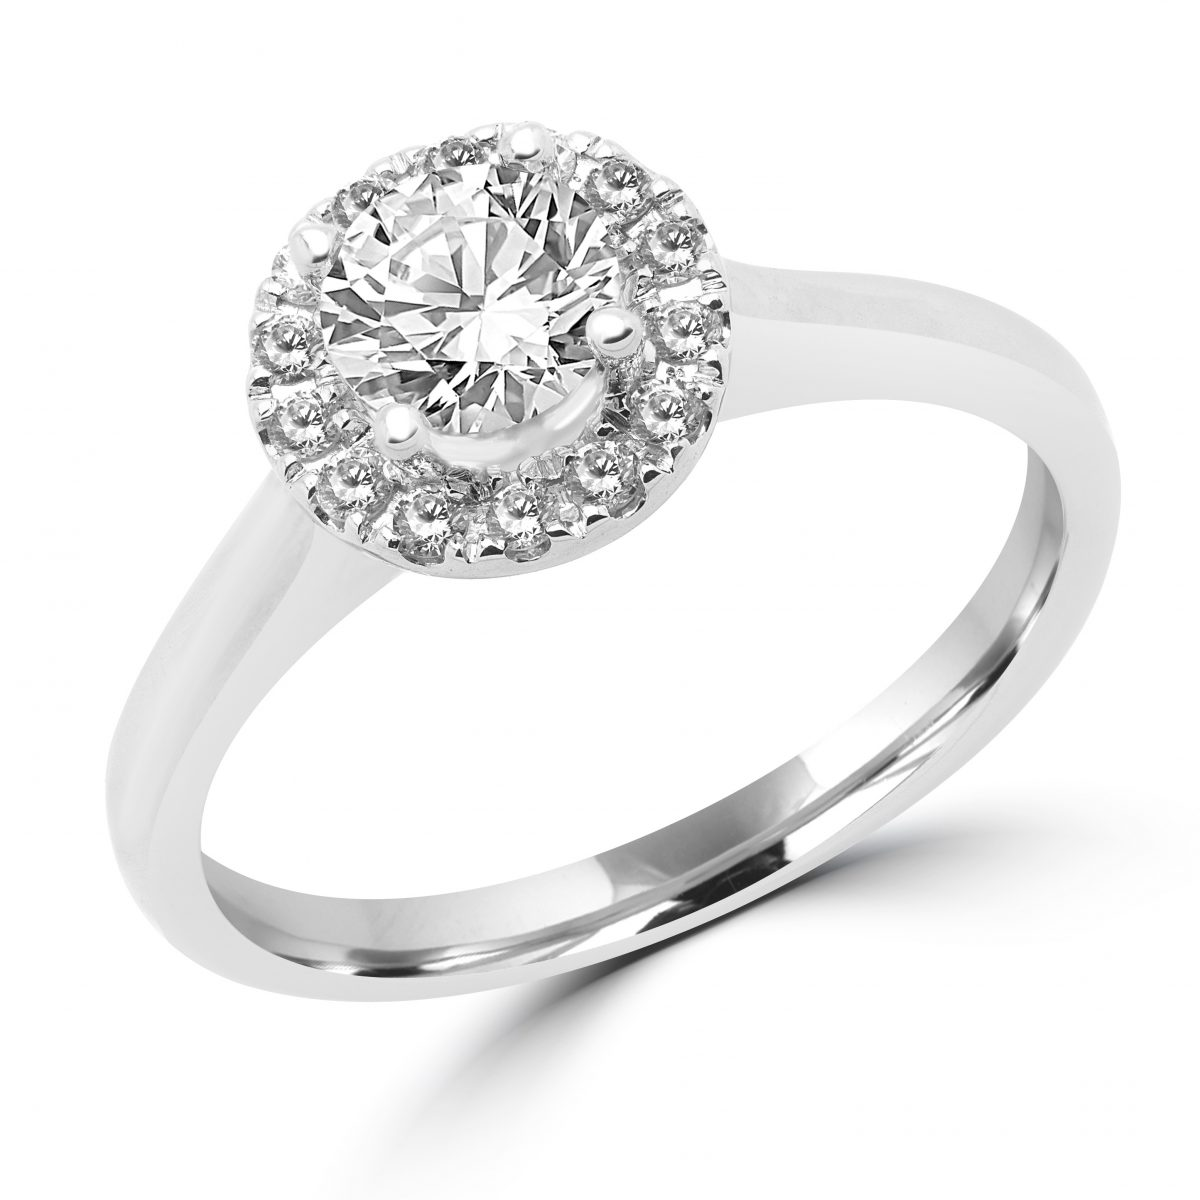 0.61 Carat Elegant Diamond Halo Engagement Ring 14k White